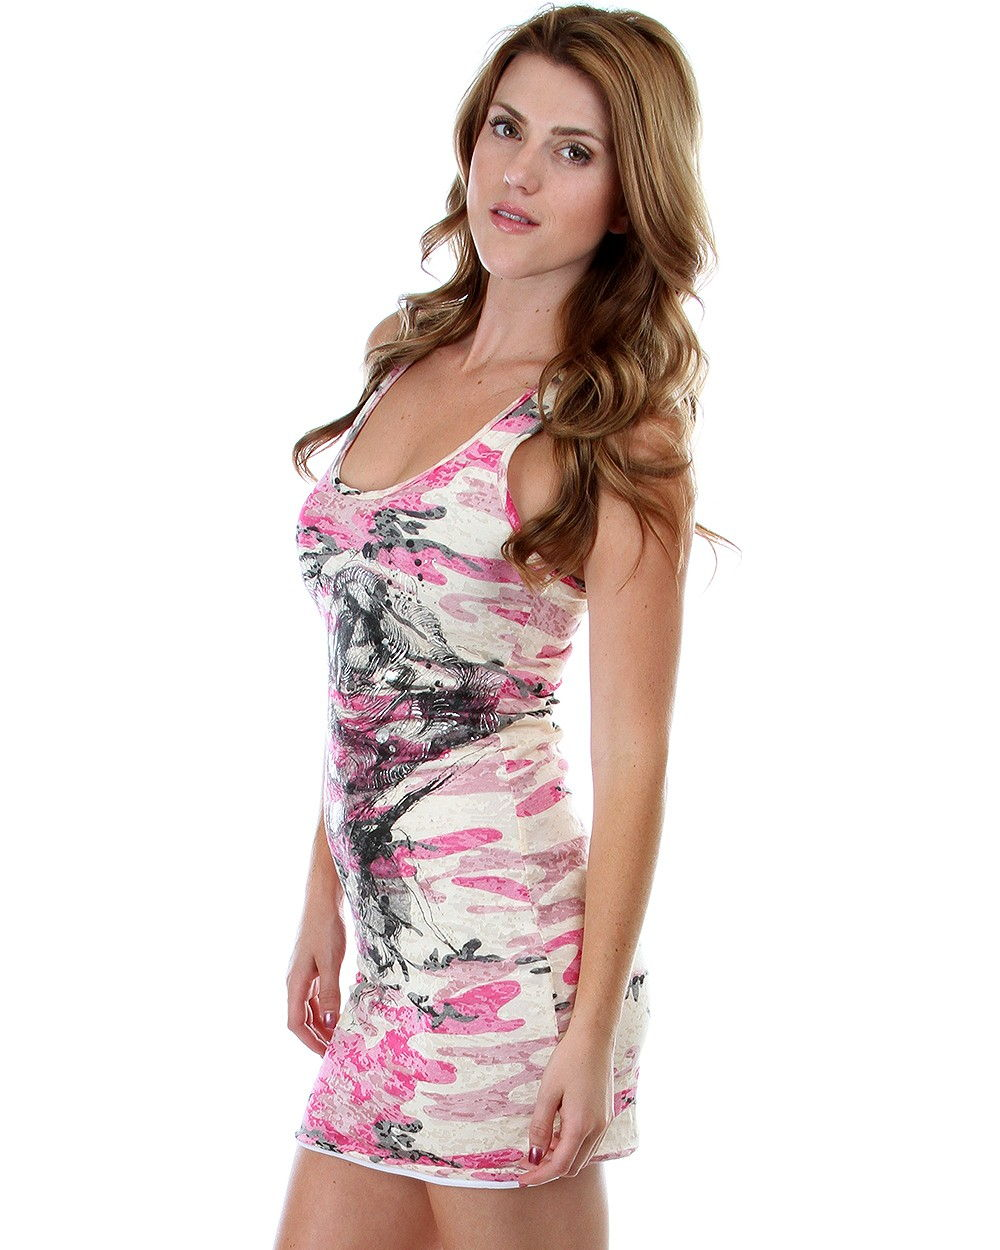 Sexy birthday dress ideas